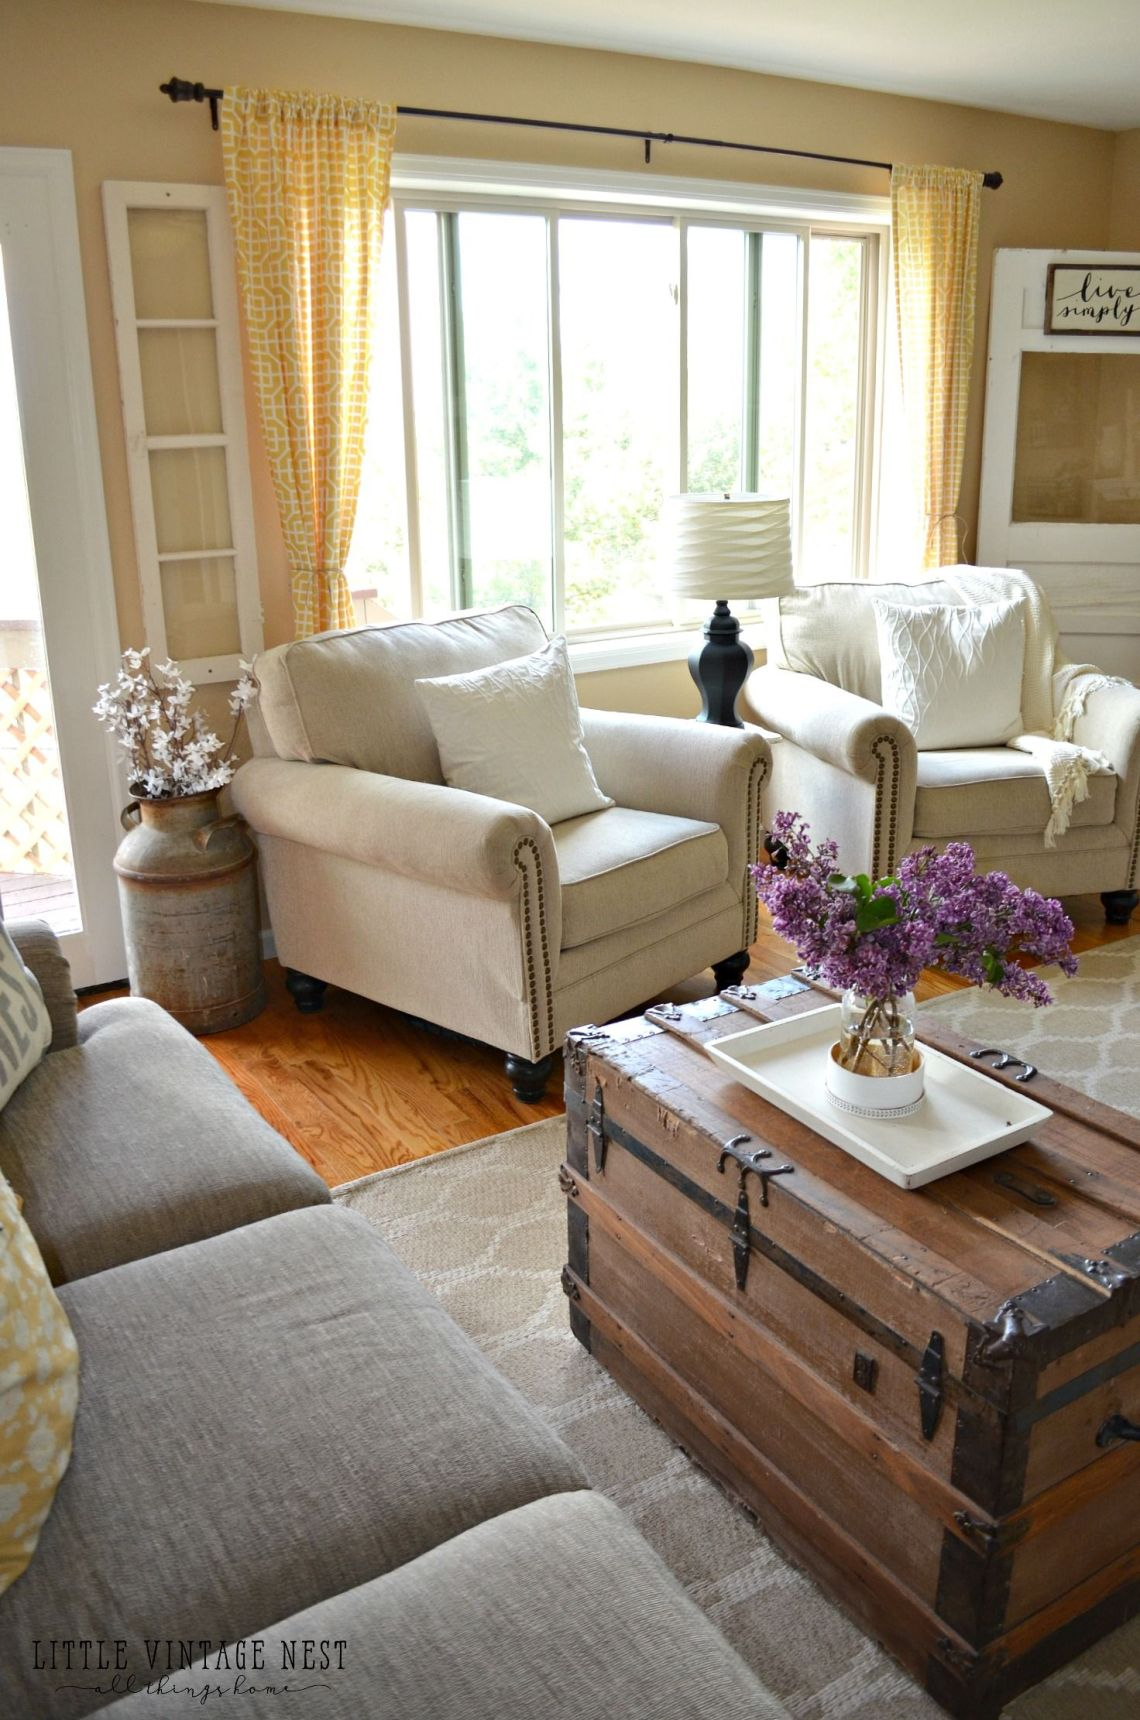 Modern Farmhouse Home Tour | Farmhouse style, Room and ...